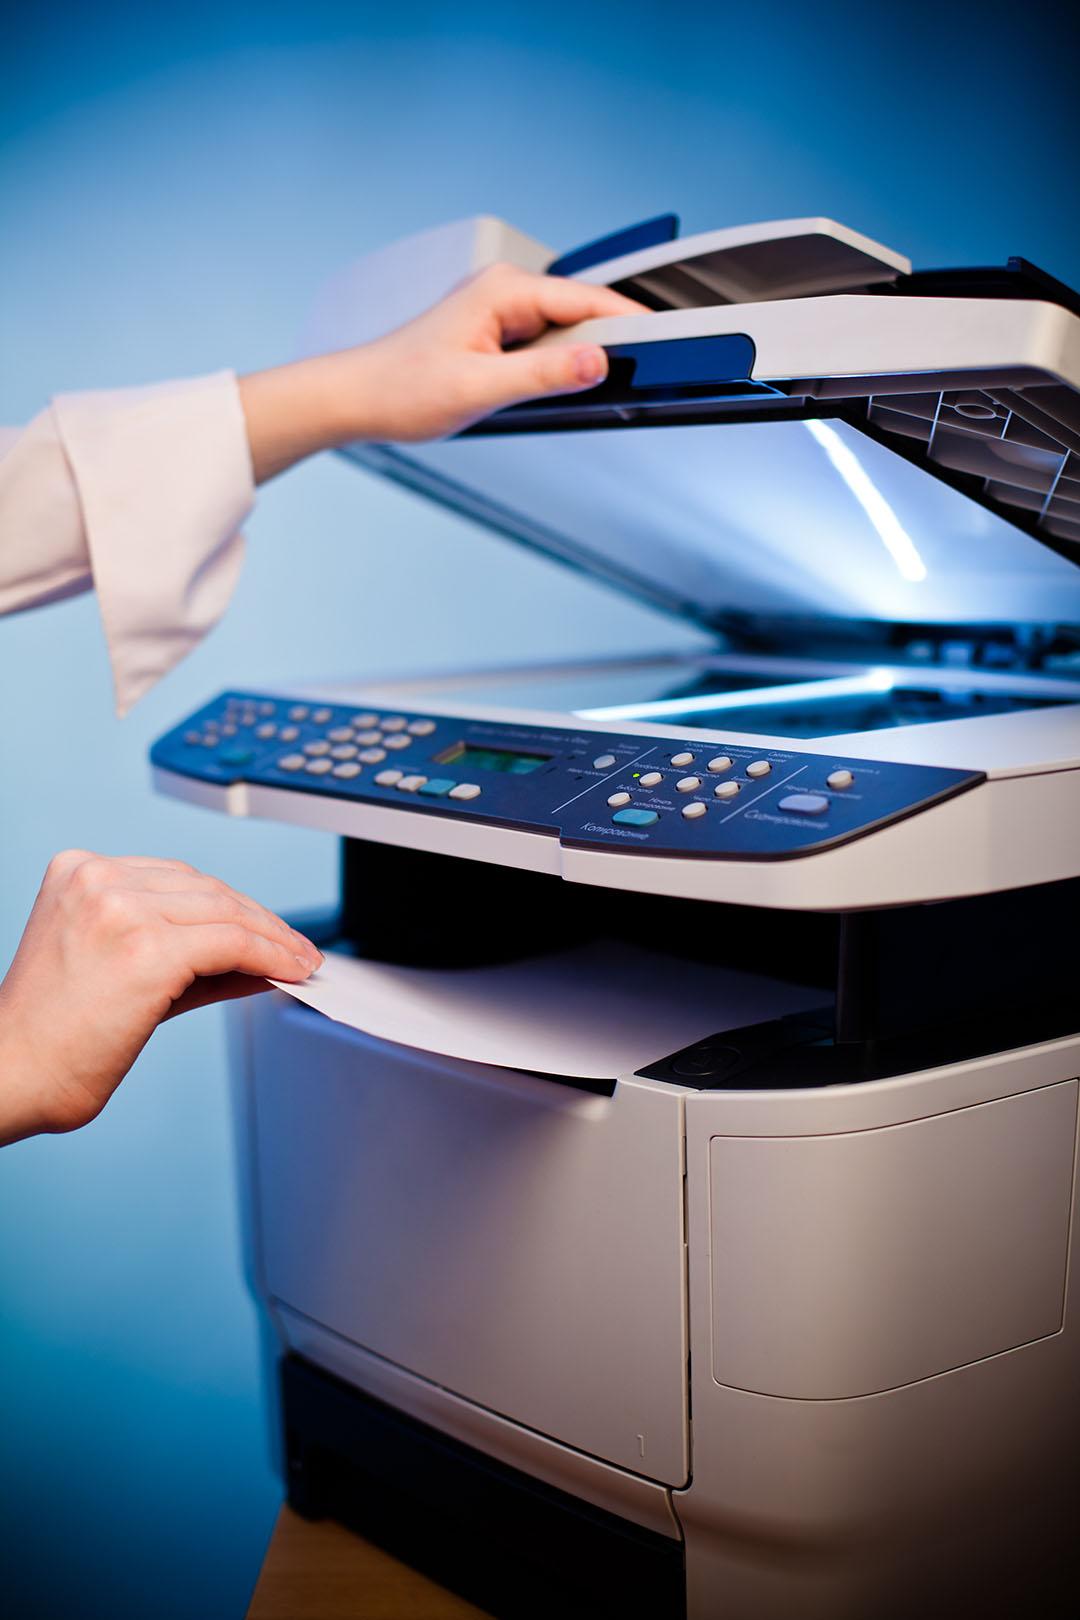 оптимизация печати